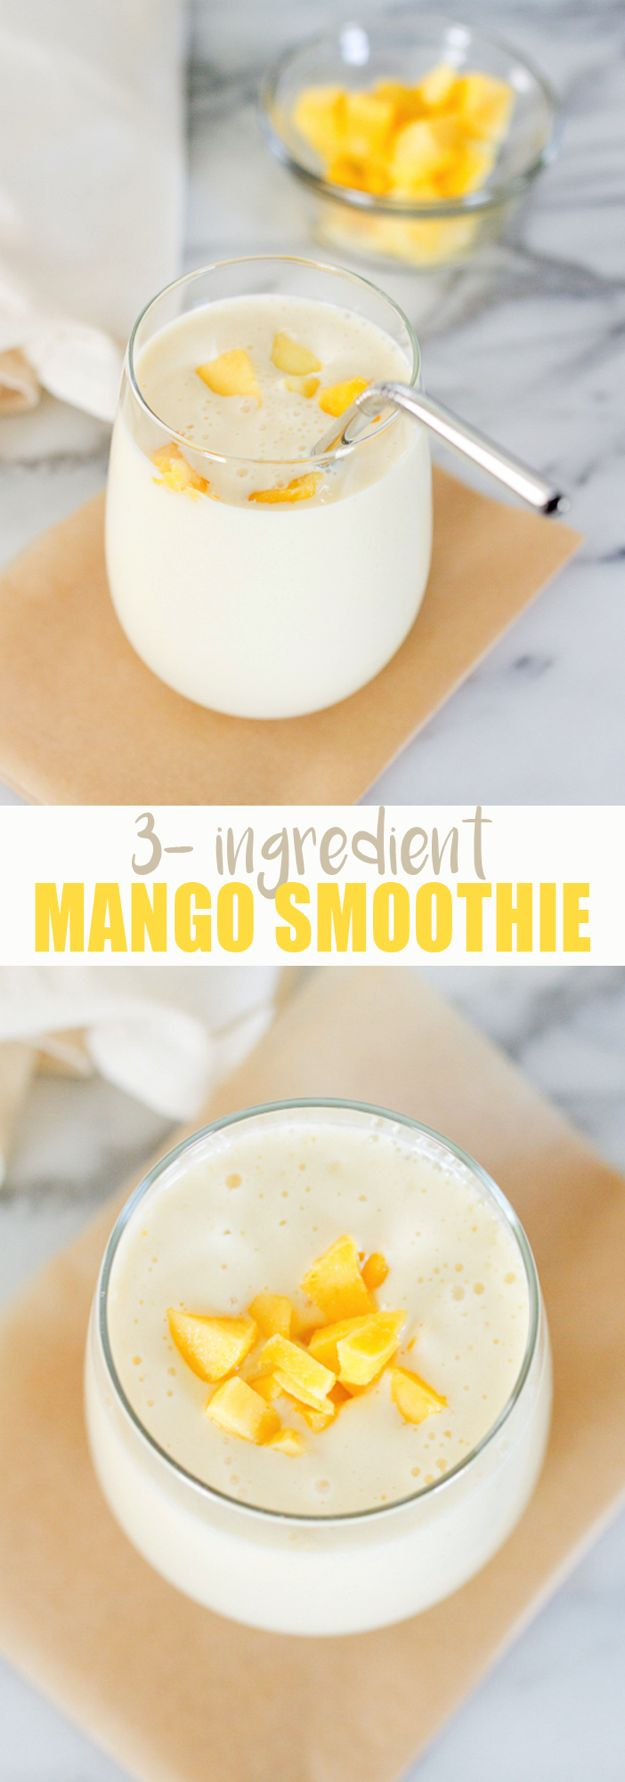 3-Ingredient Mango Smoothie // Similar to a mango lassi with protein-packed Greek yogurt, almond milk and frozen mango